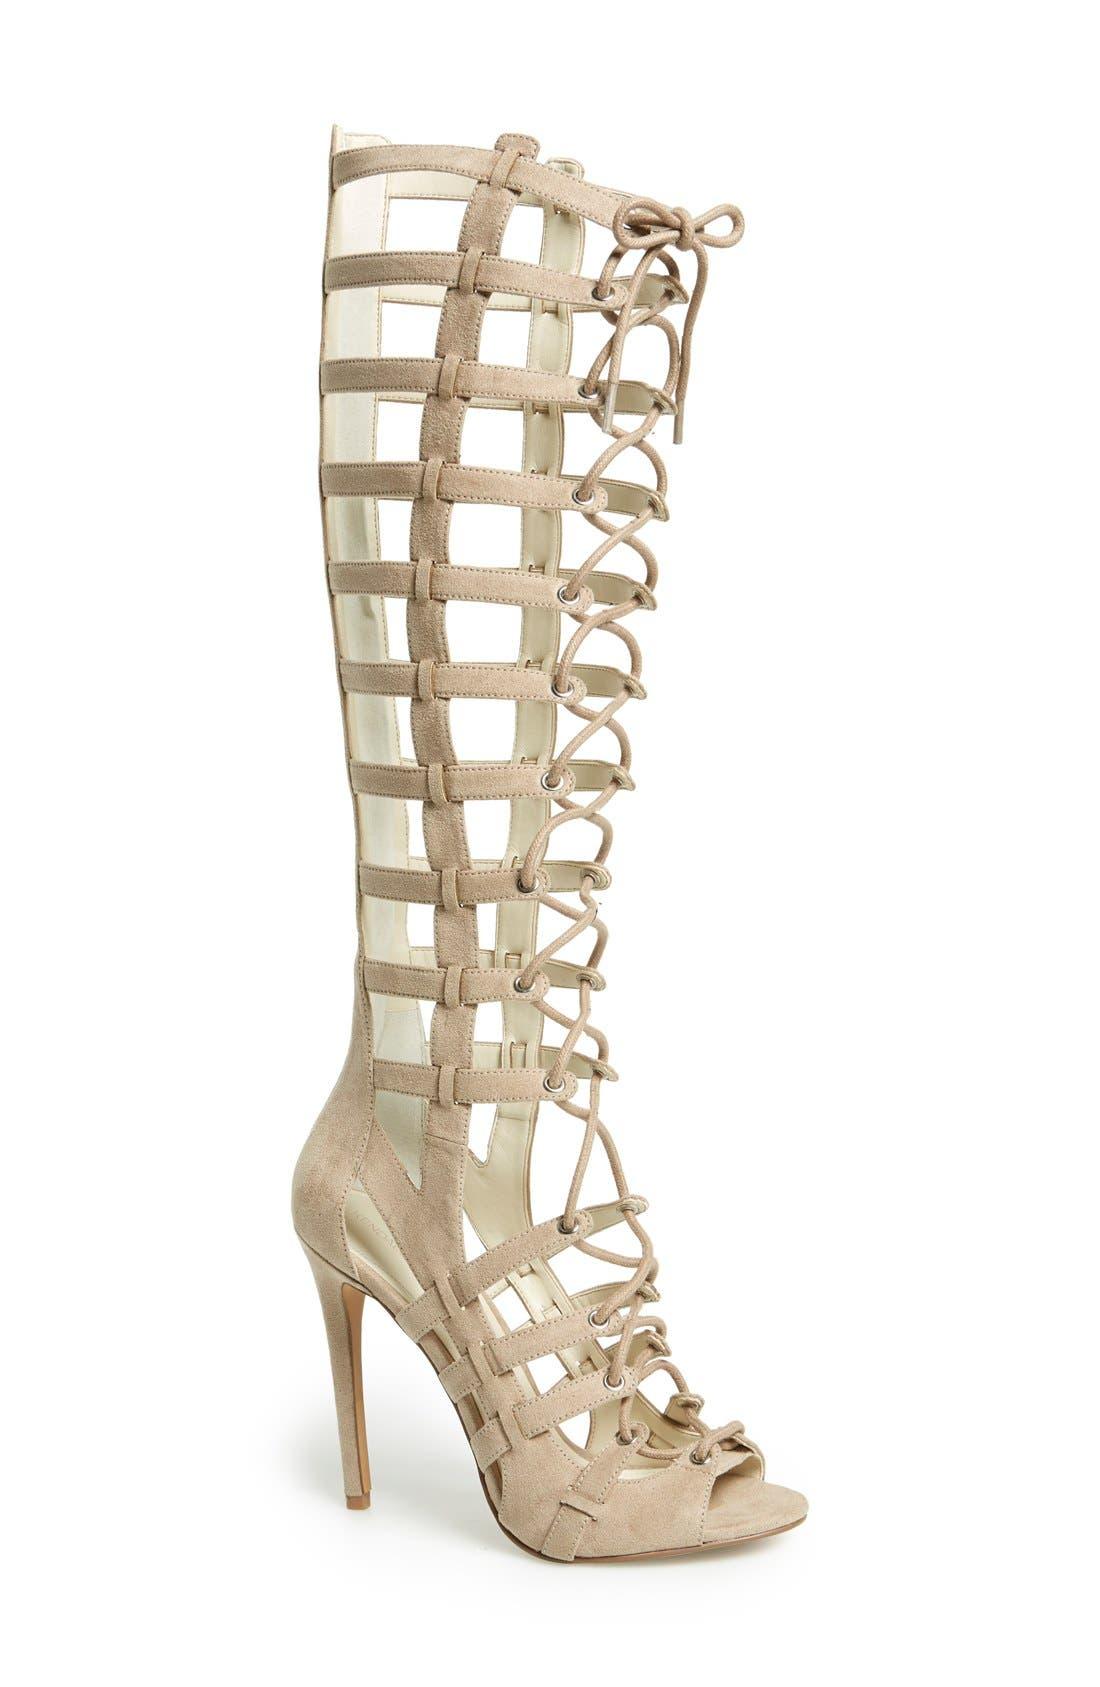 Main Image - KENDALL + KYLIE 'Emily' Tall Gladiator Sandal (Women)